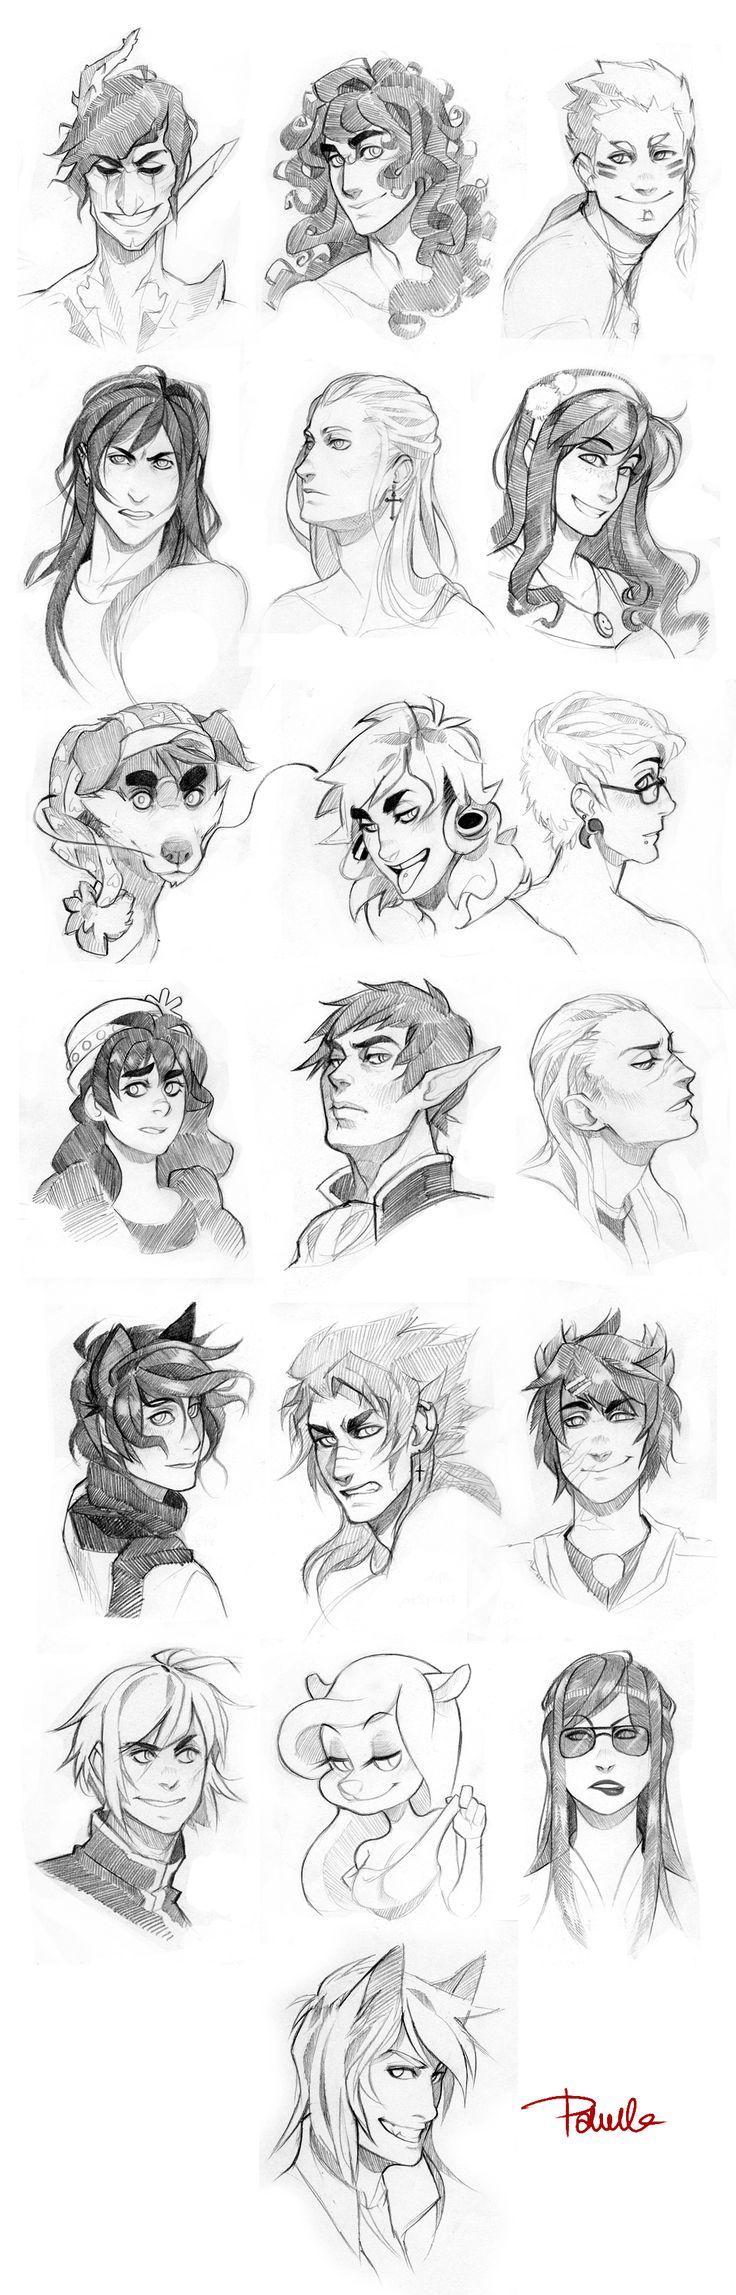 Sketch commissions 02 by SylwiaPakulska.deviantart.com on @deviantART